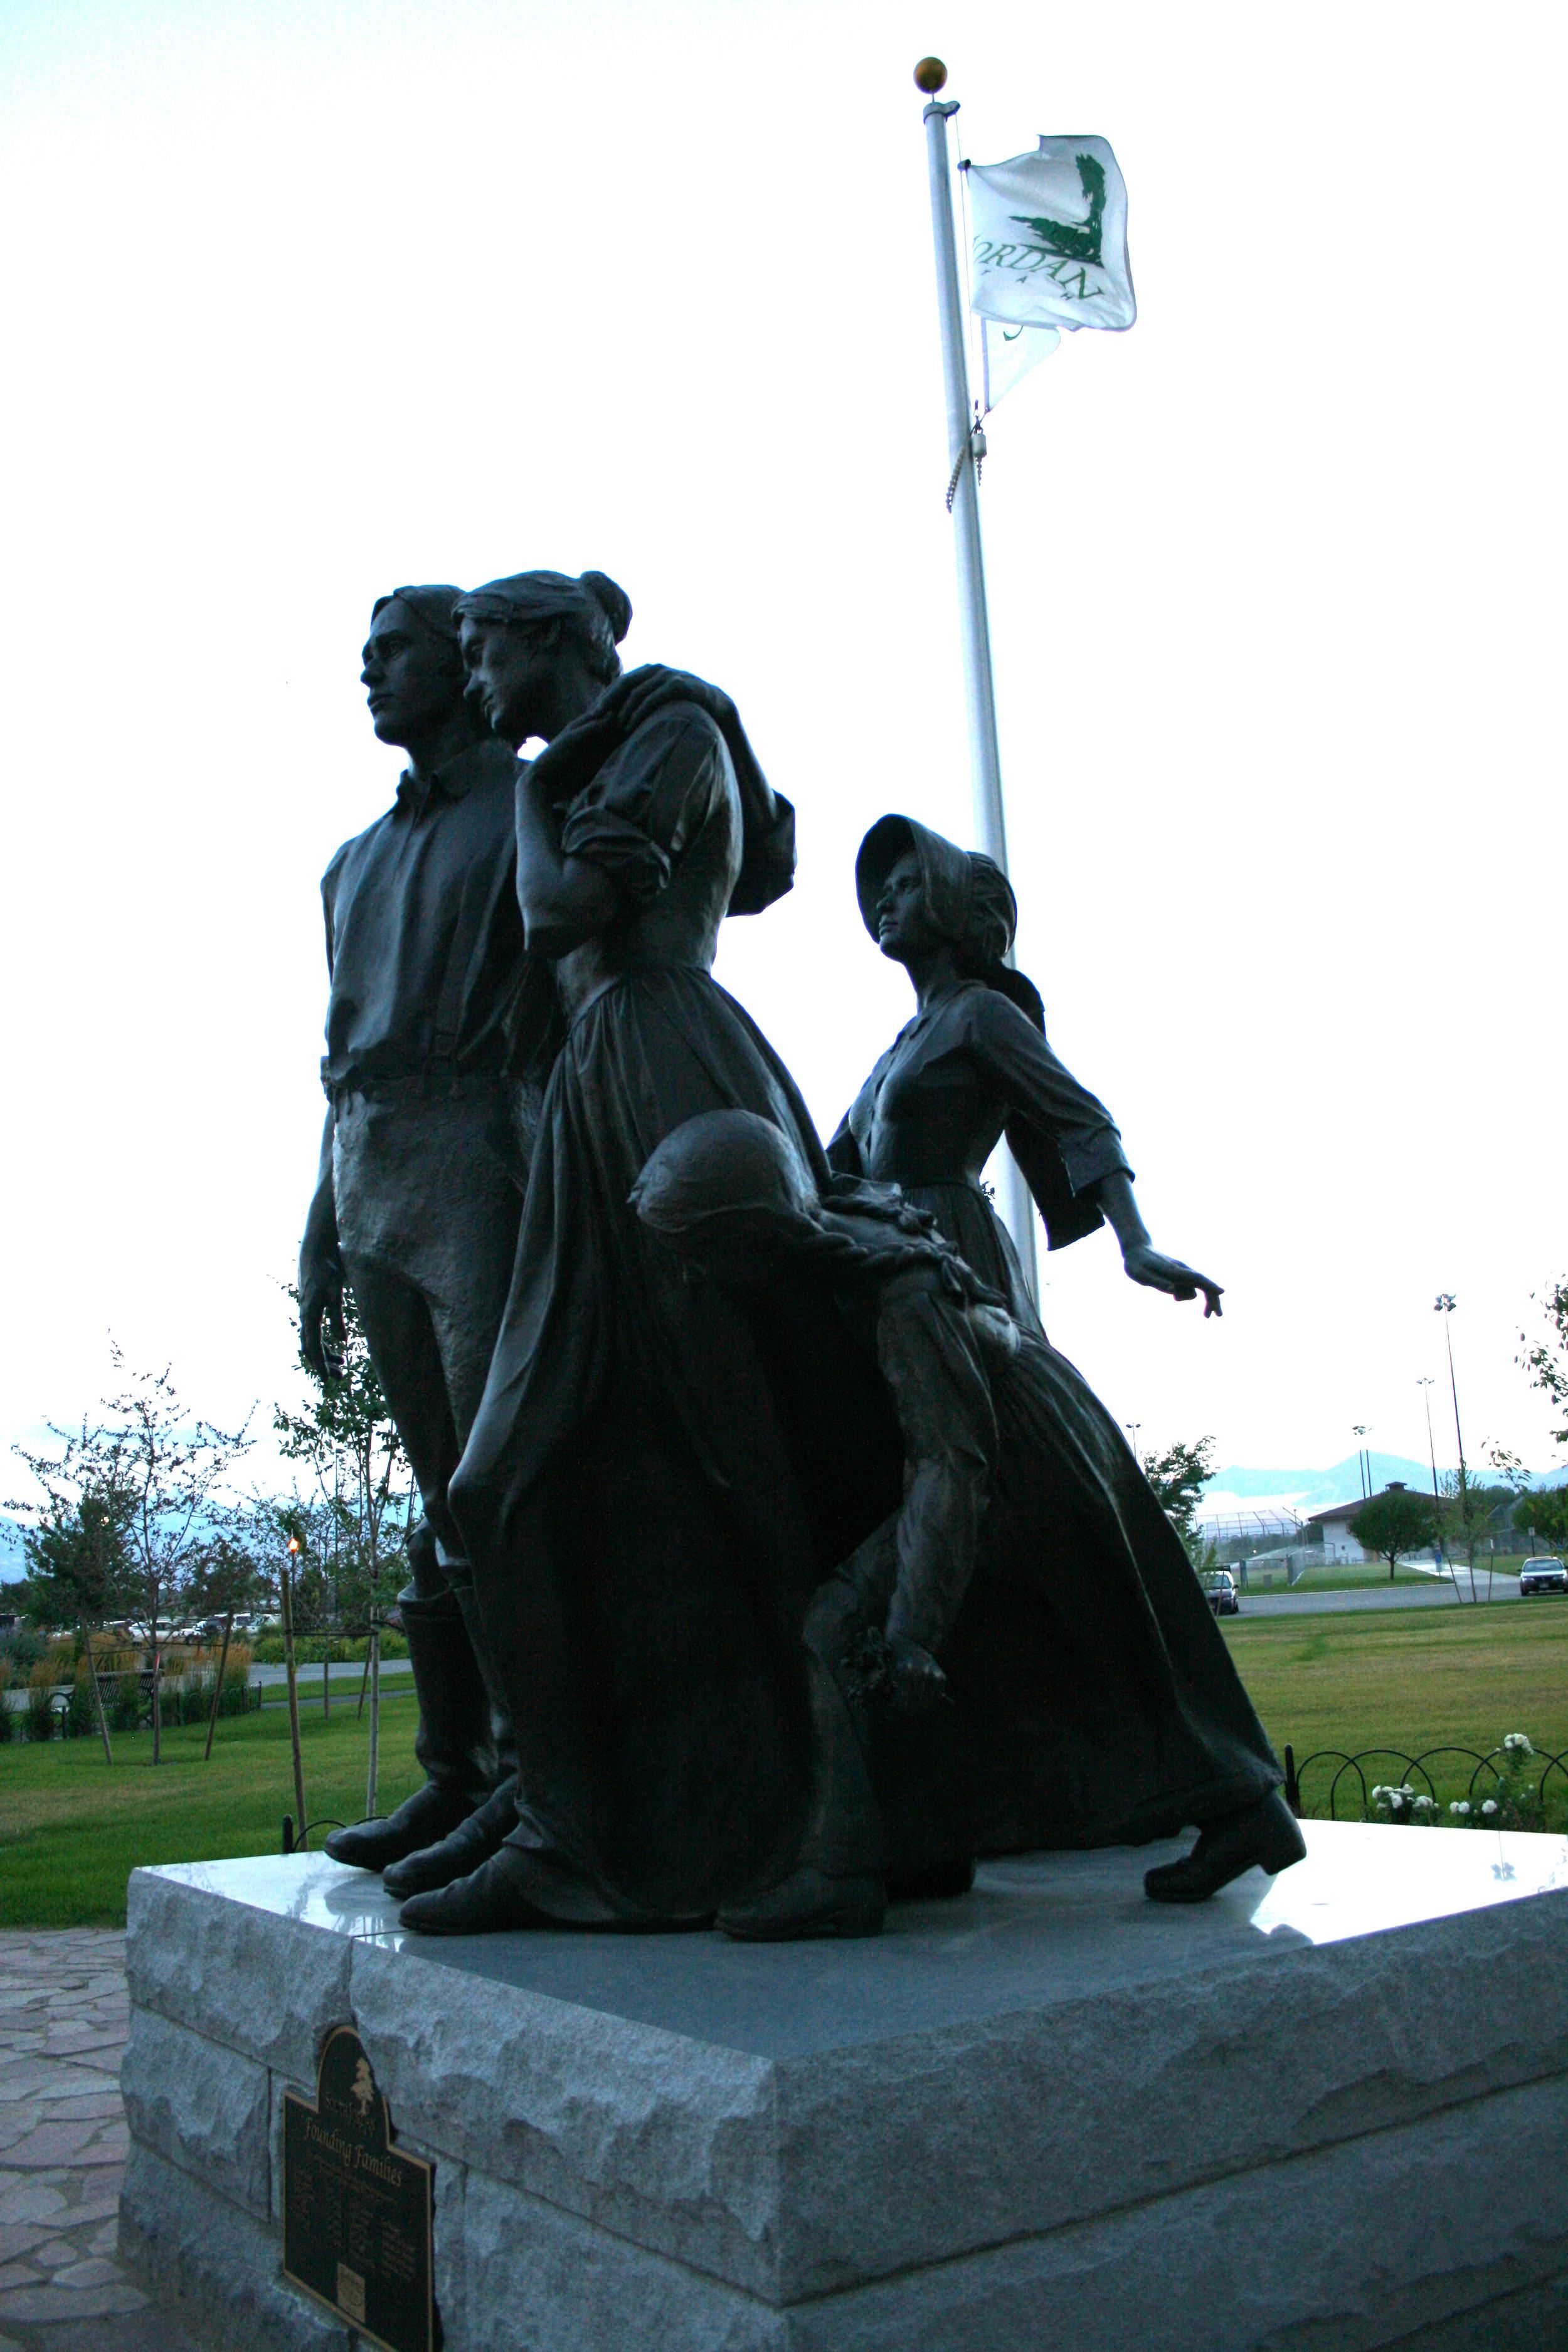 the Beakstesd Memorial